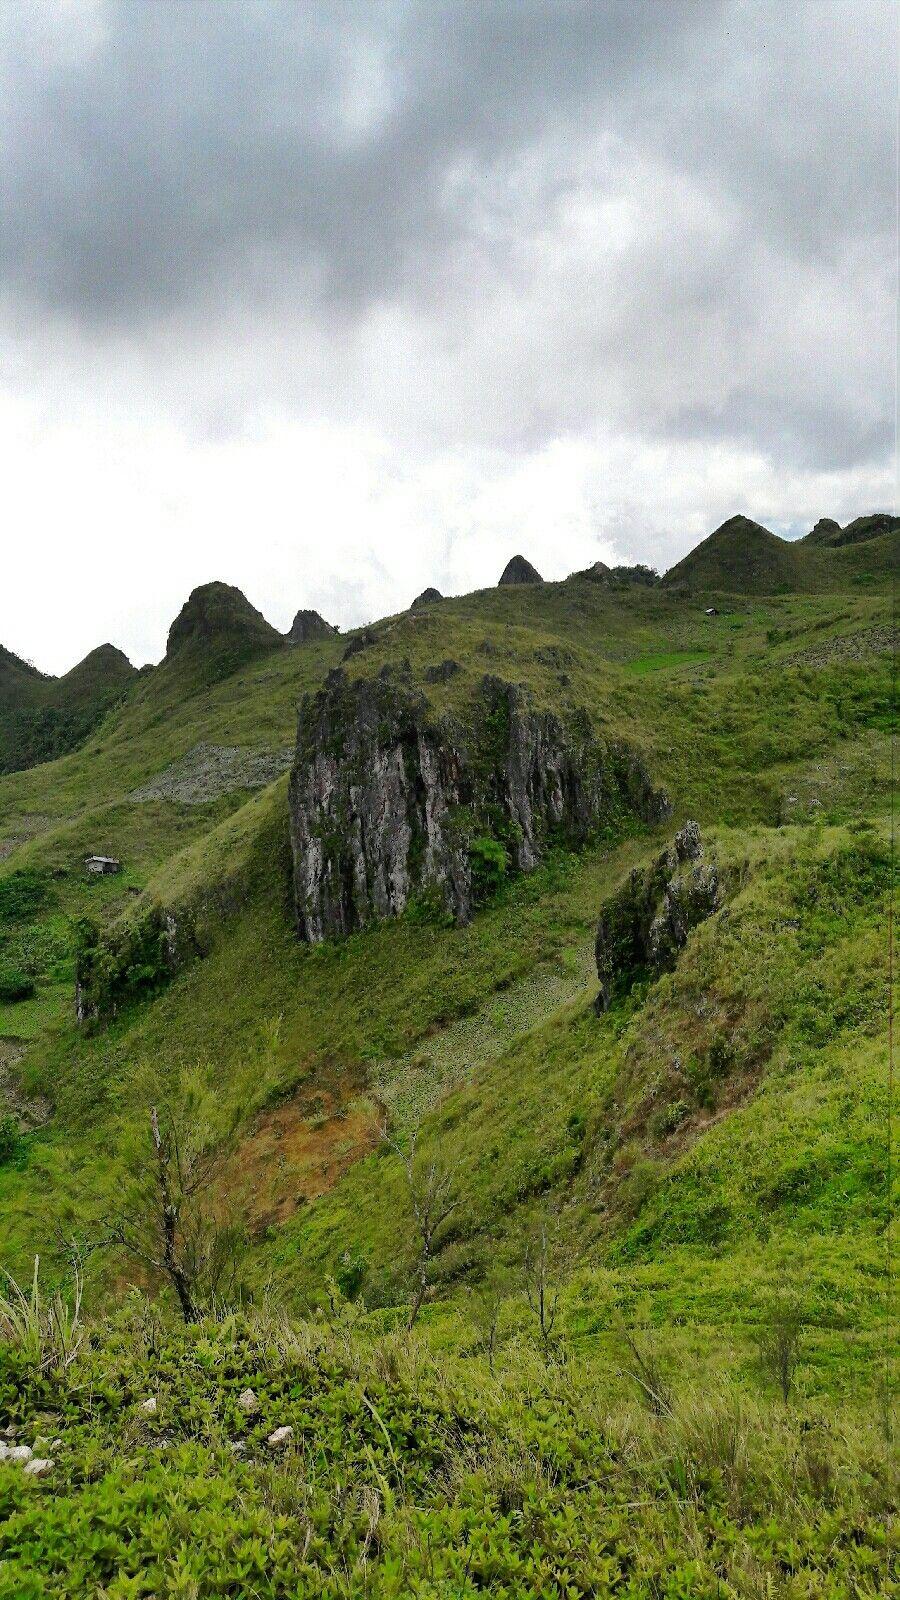 Pin by Andres Ruste on Osmeña Peak Dalaguete, Cebu